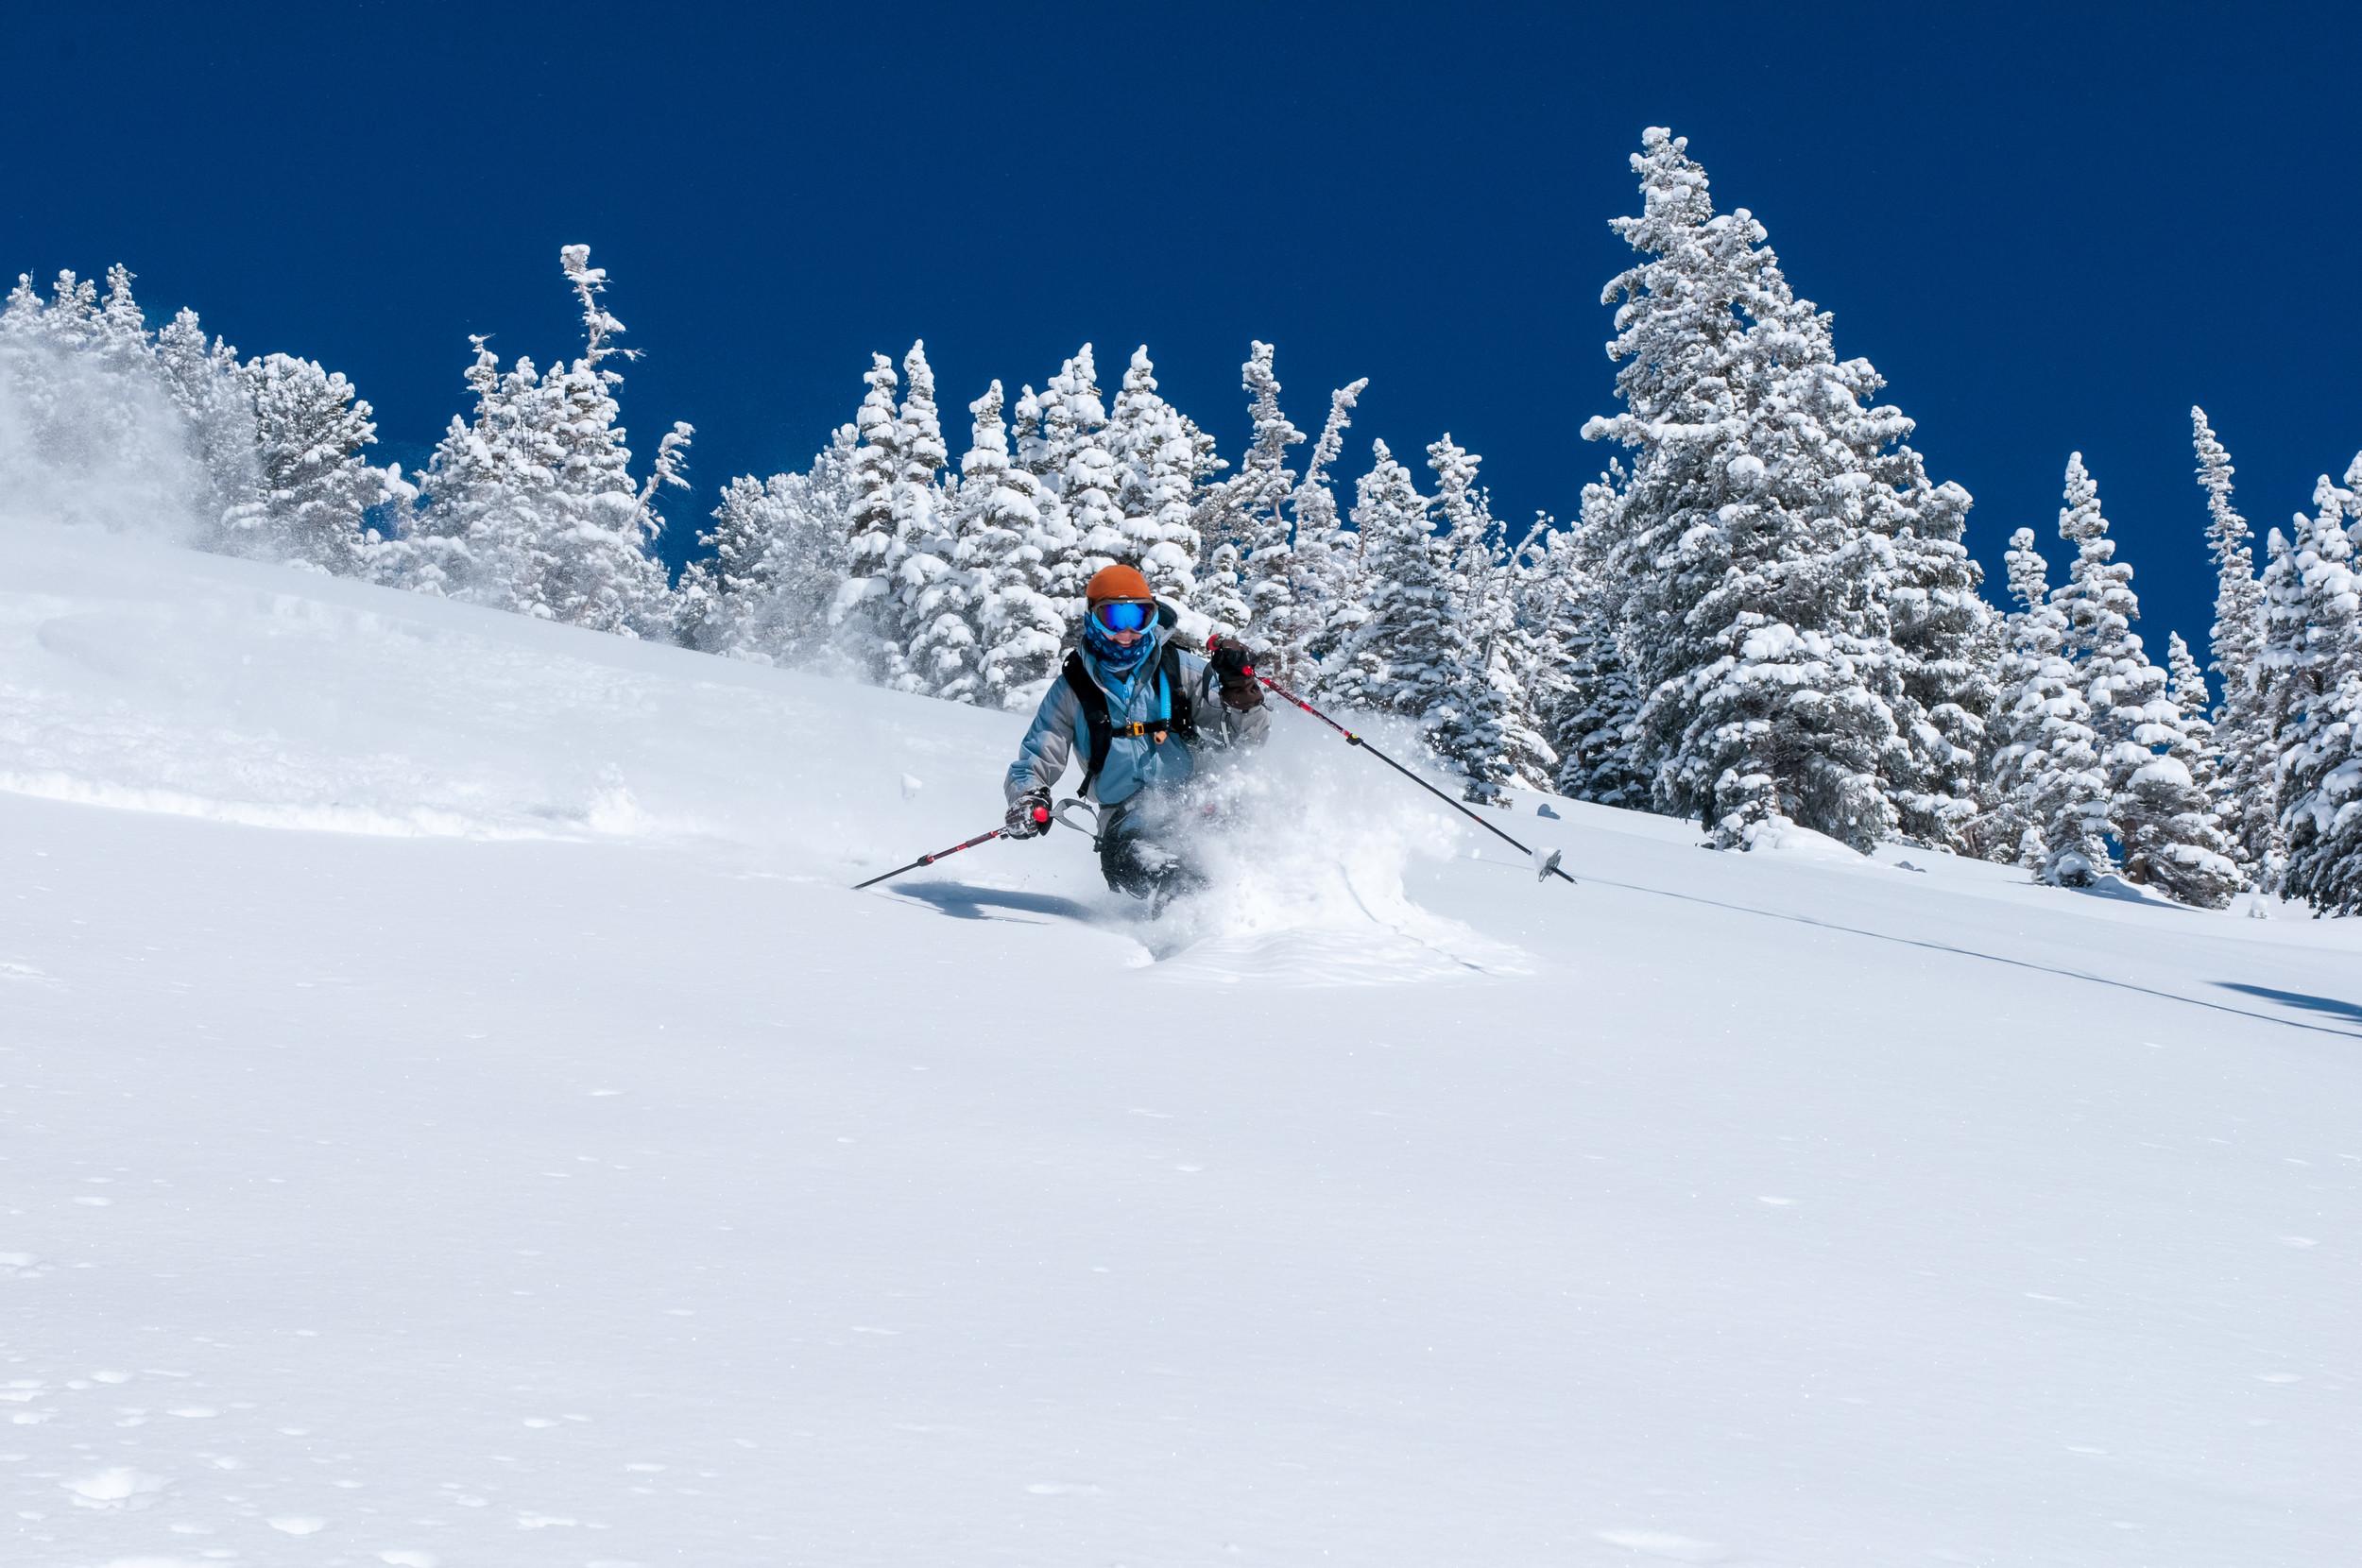 Powder skiing in Canada on your BC ski safari.